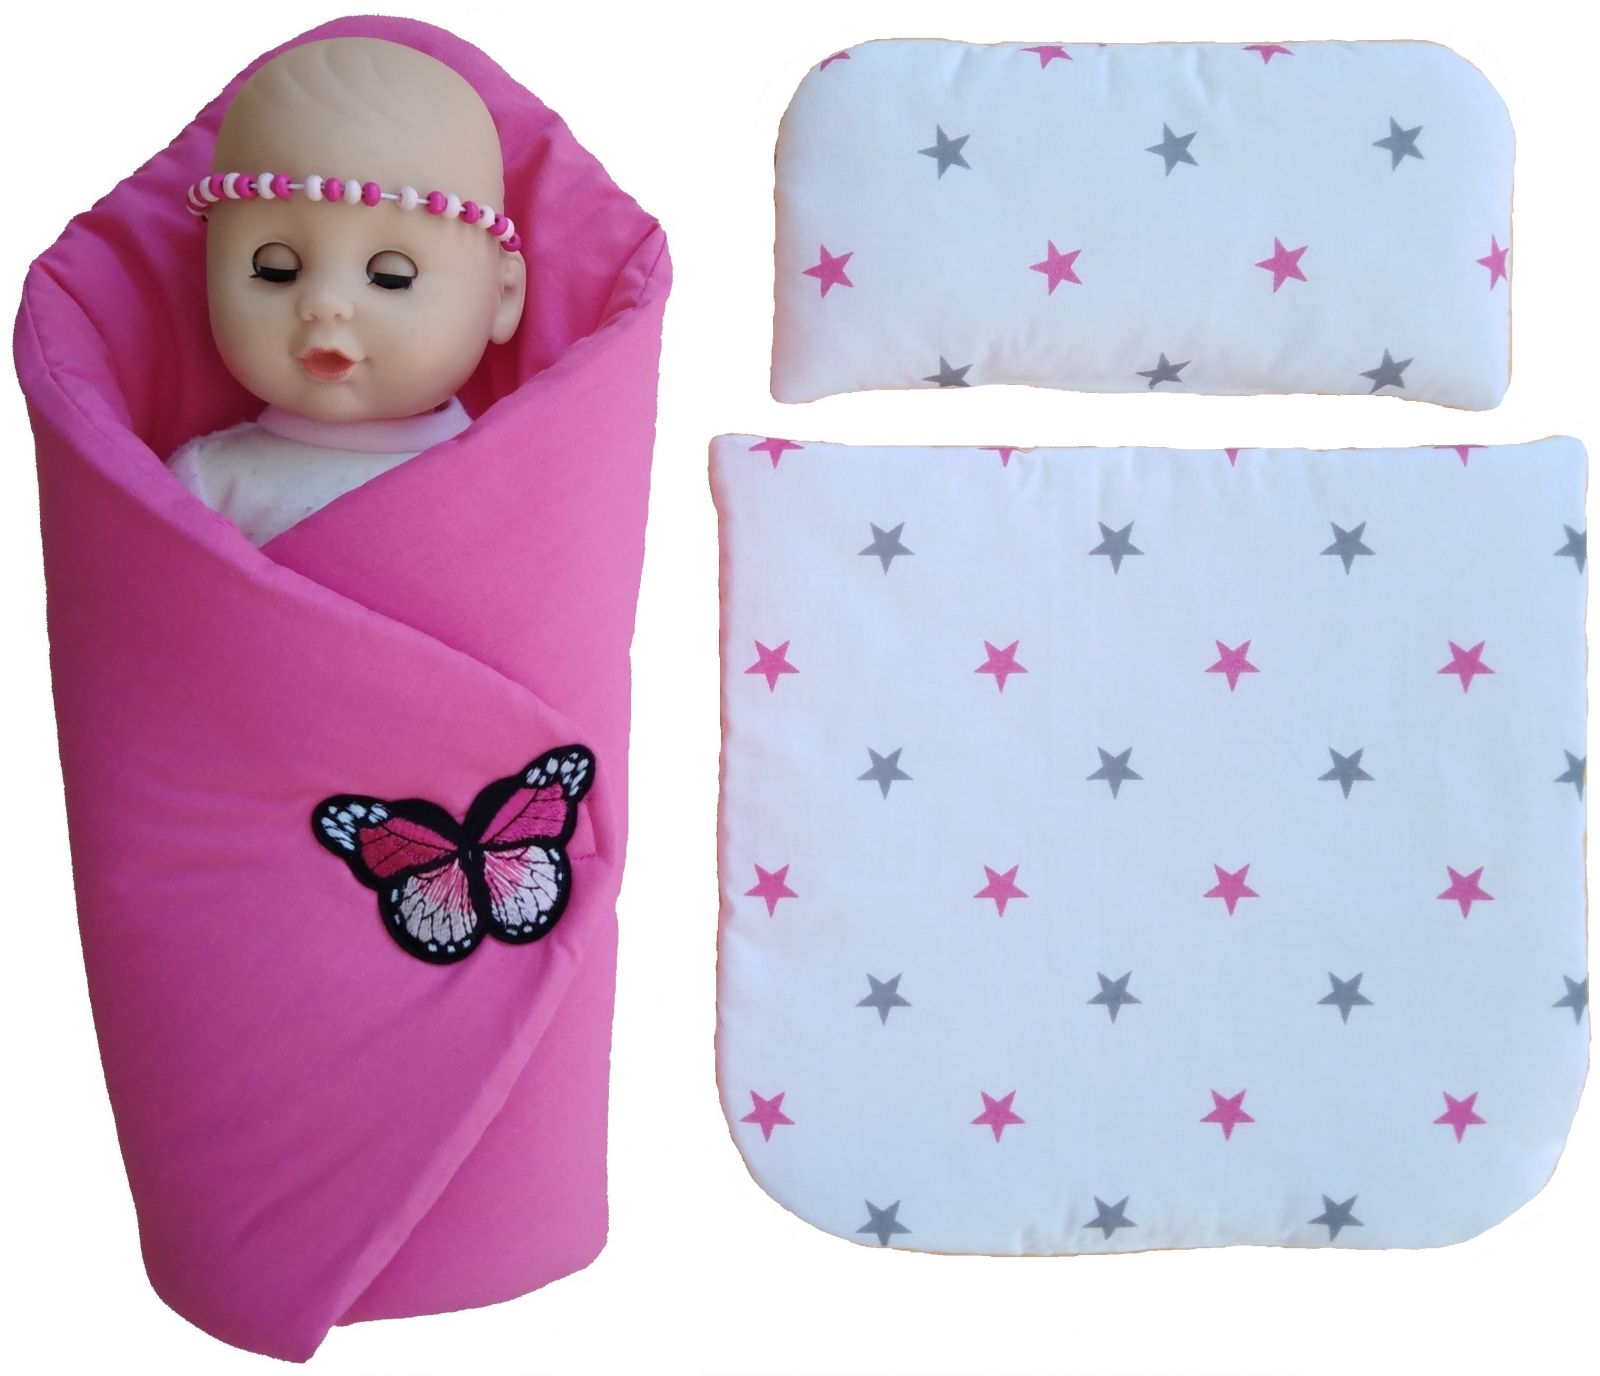 Sada pro panenku - zavinovačka, peřinka a polštářek Miminkaabatolata